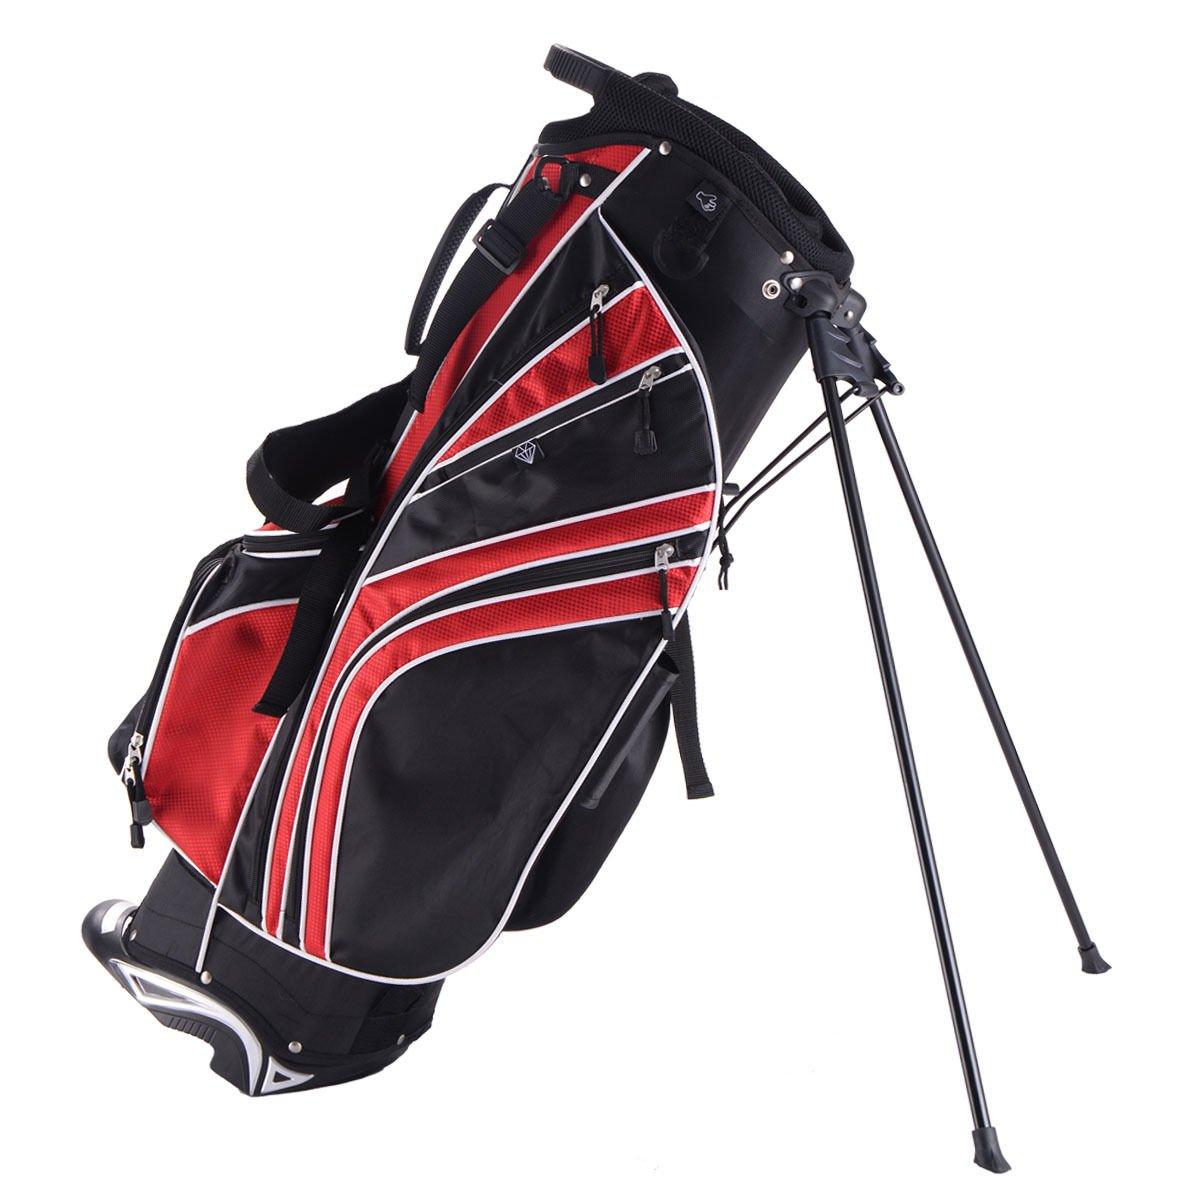 Red 6 Way Divider Golf Stand Bag Carry Organizer